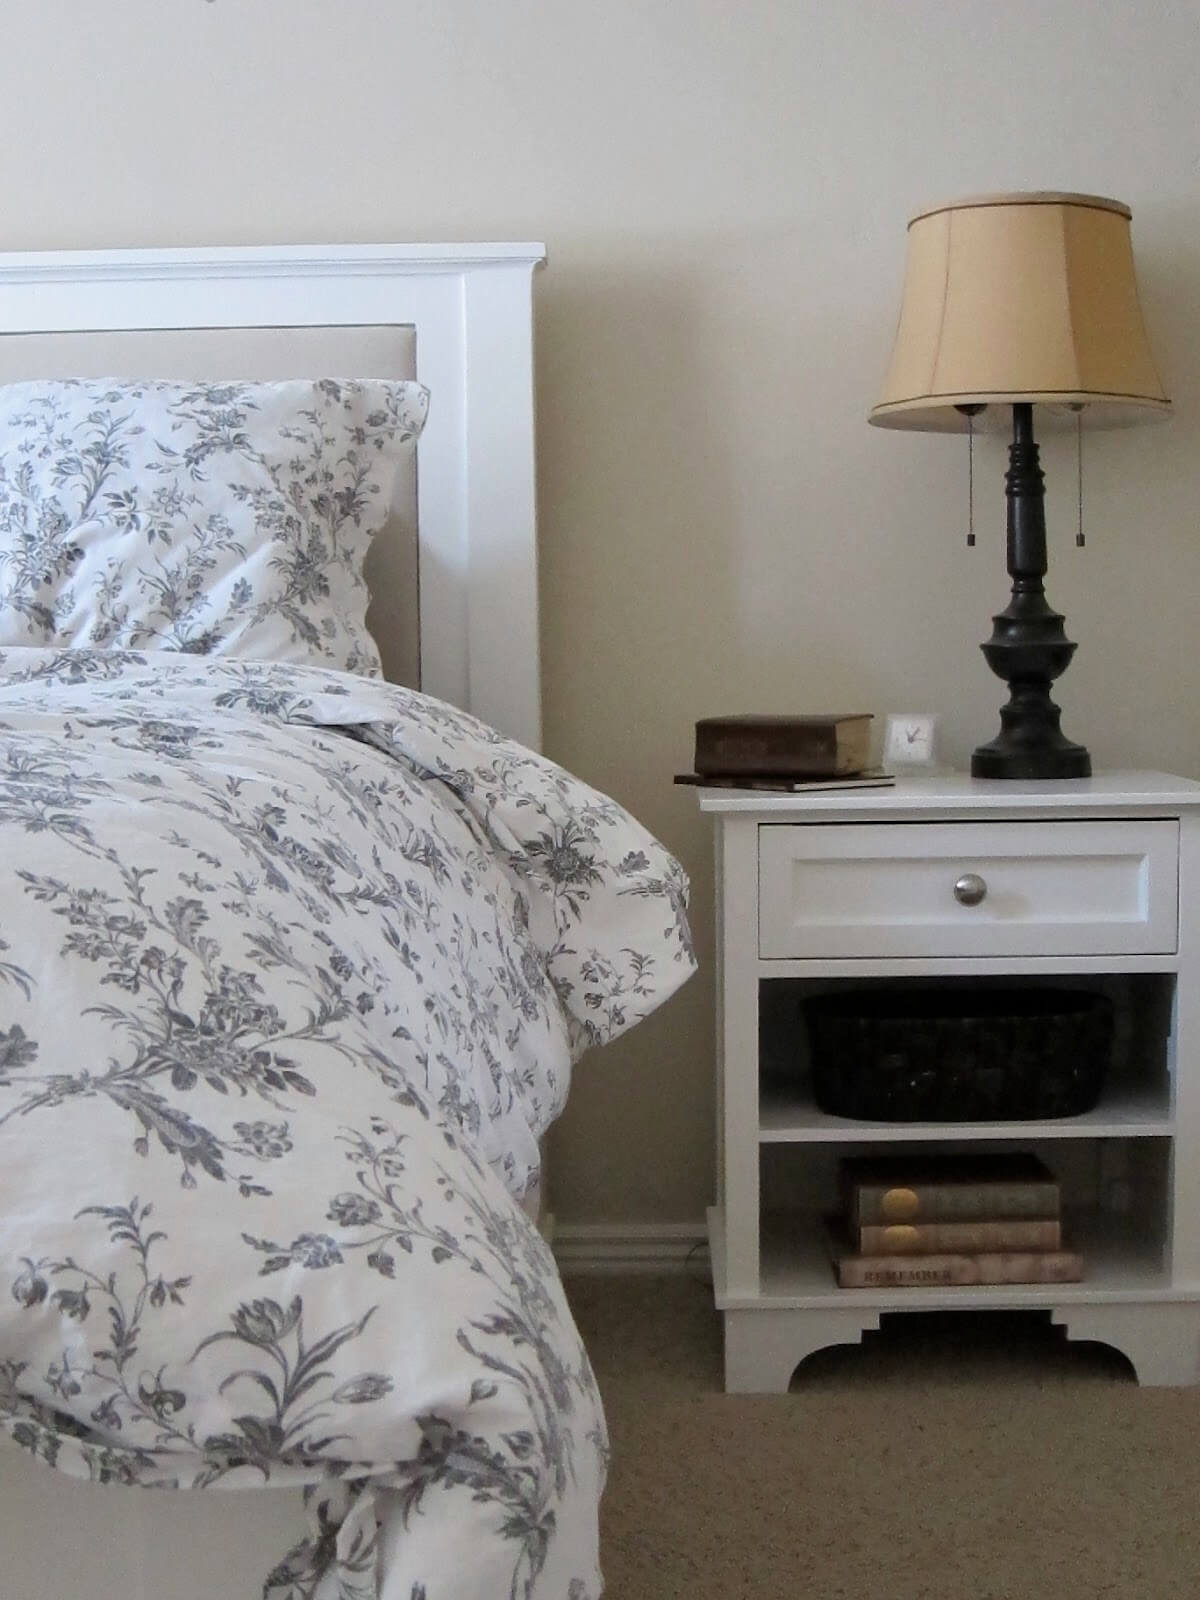 diy nightstand plans